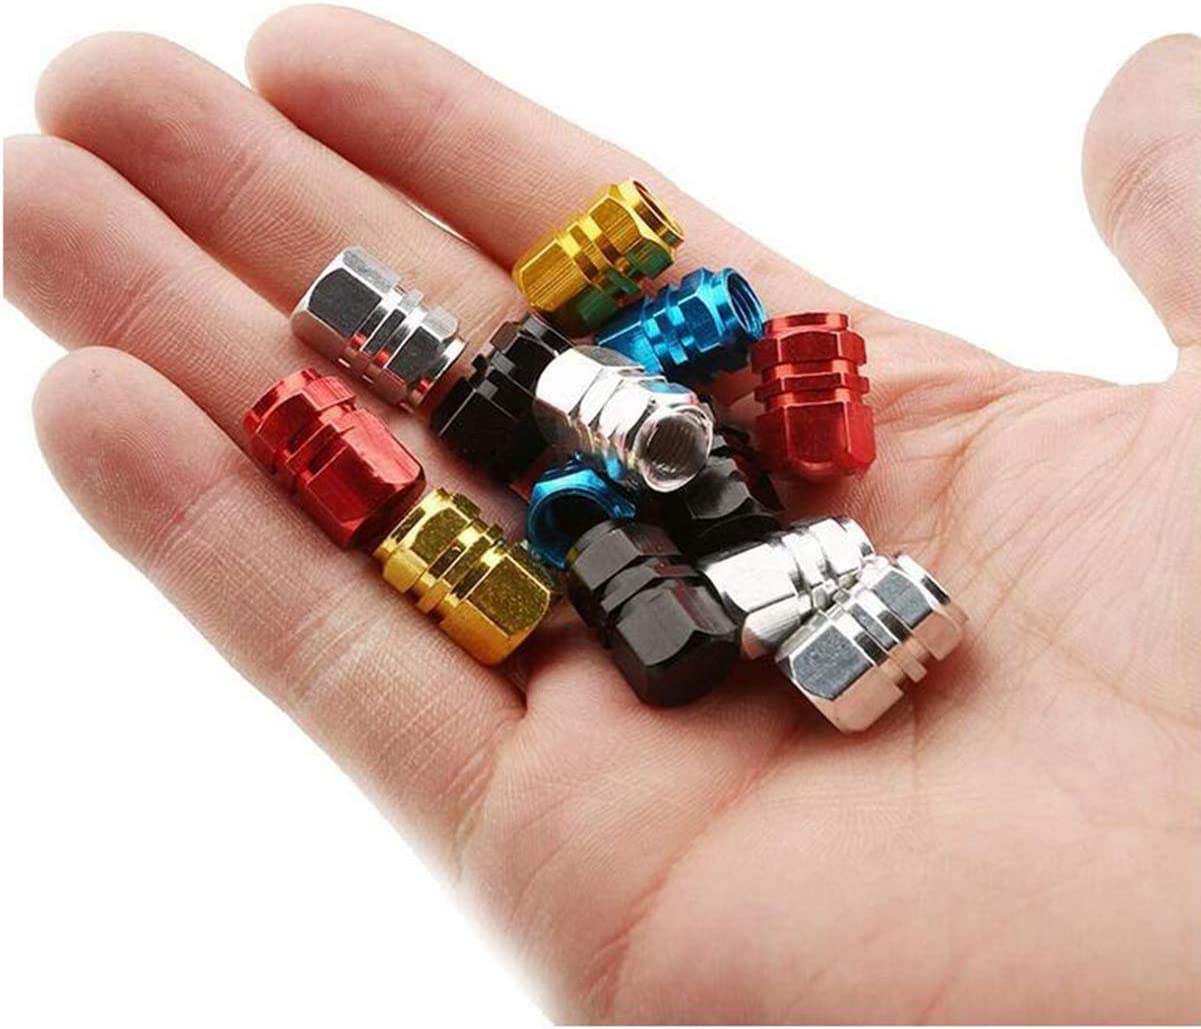 5 Colores Biluer Tapones de V/álvula 60PCS Tapas de V/álvulas de Neum/ático Tapones de v/álvula de Aleaci/ón de Aluminio V/álvula de Neum/ático Cubiertas de Polvo para Moto Cami/ón Bicicleta